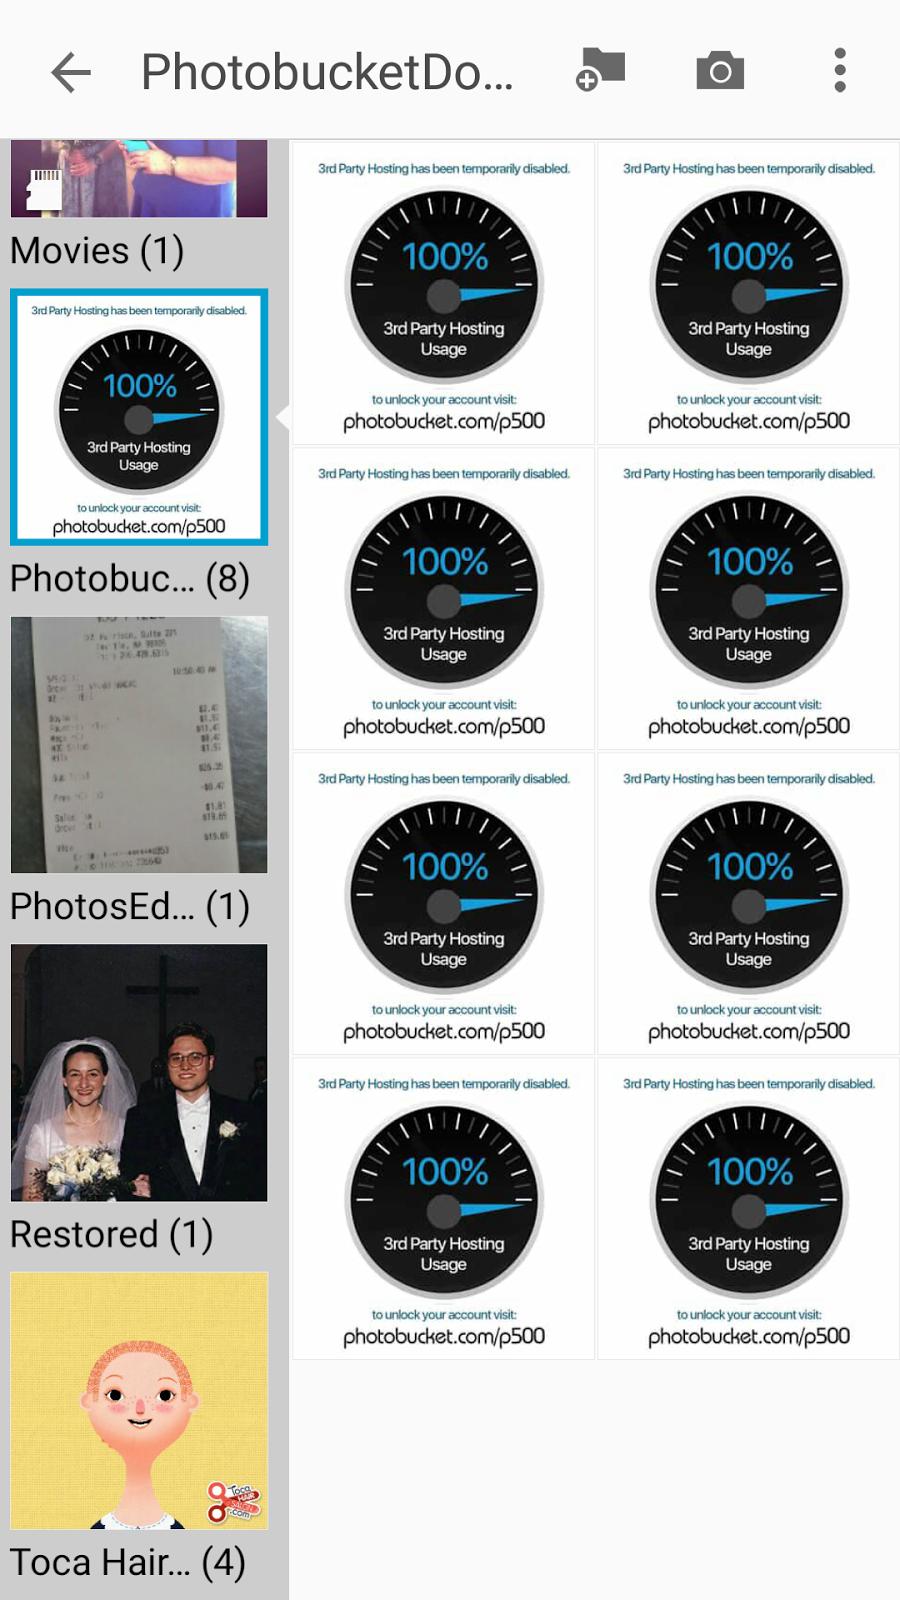 lauren wayne: photobucket phail, or how to ruin a hosting site